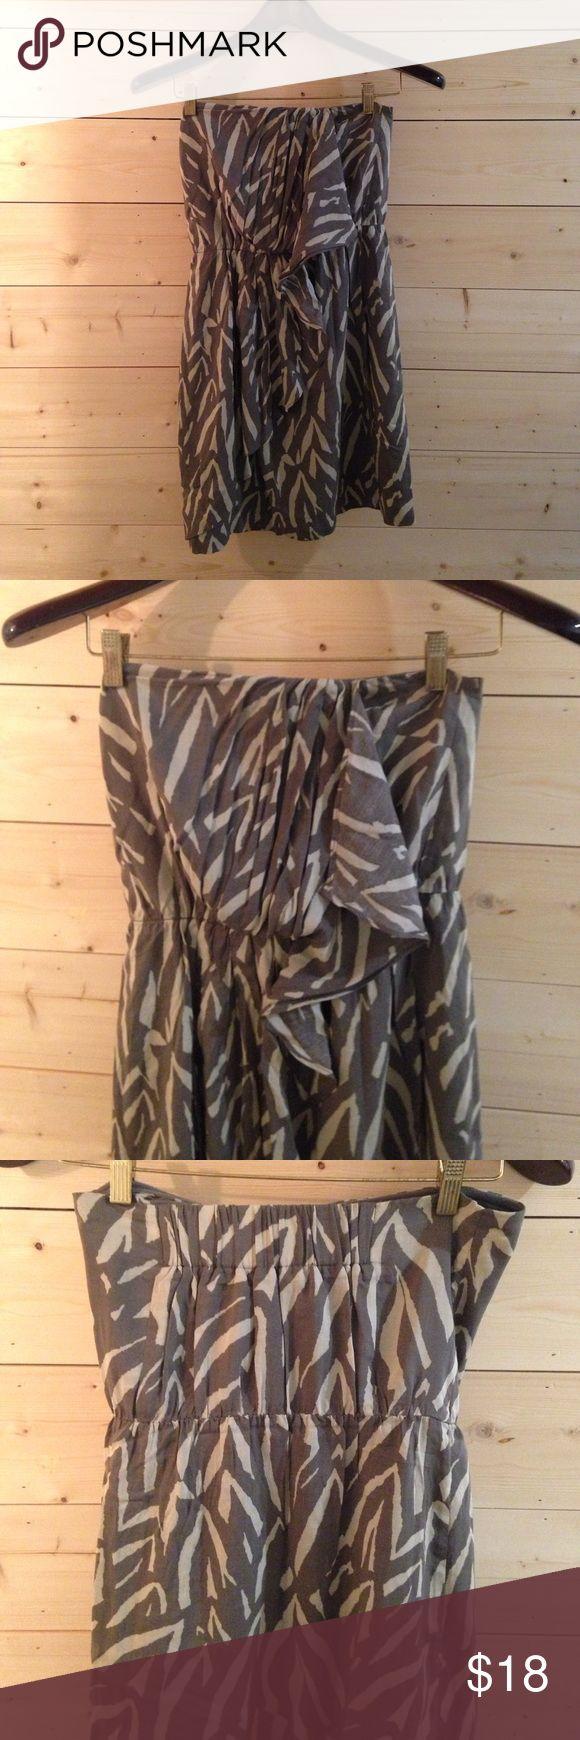 Gap Grey Strapless Zebra Print Dress Comfy grey zebra print strapless dress from Gap. GAP Dresses Strapless